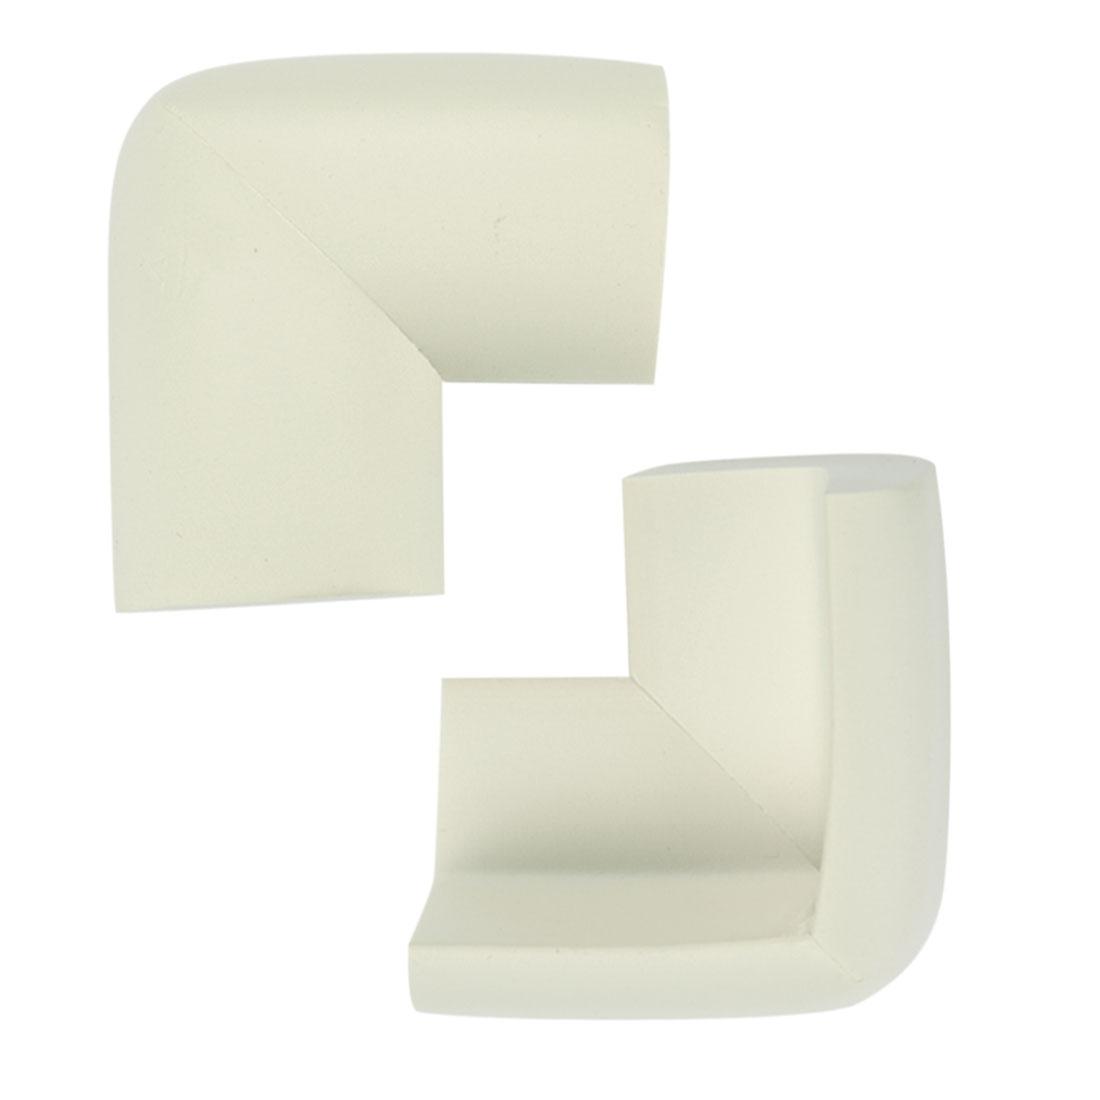 2pcs White Desk Edge Foam Corner Cushion Guard Strip Soft Bumper Protector